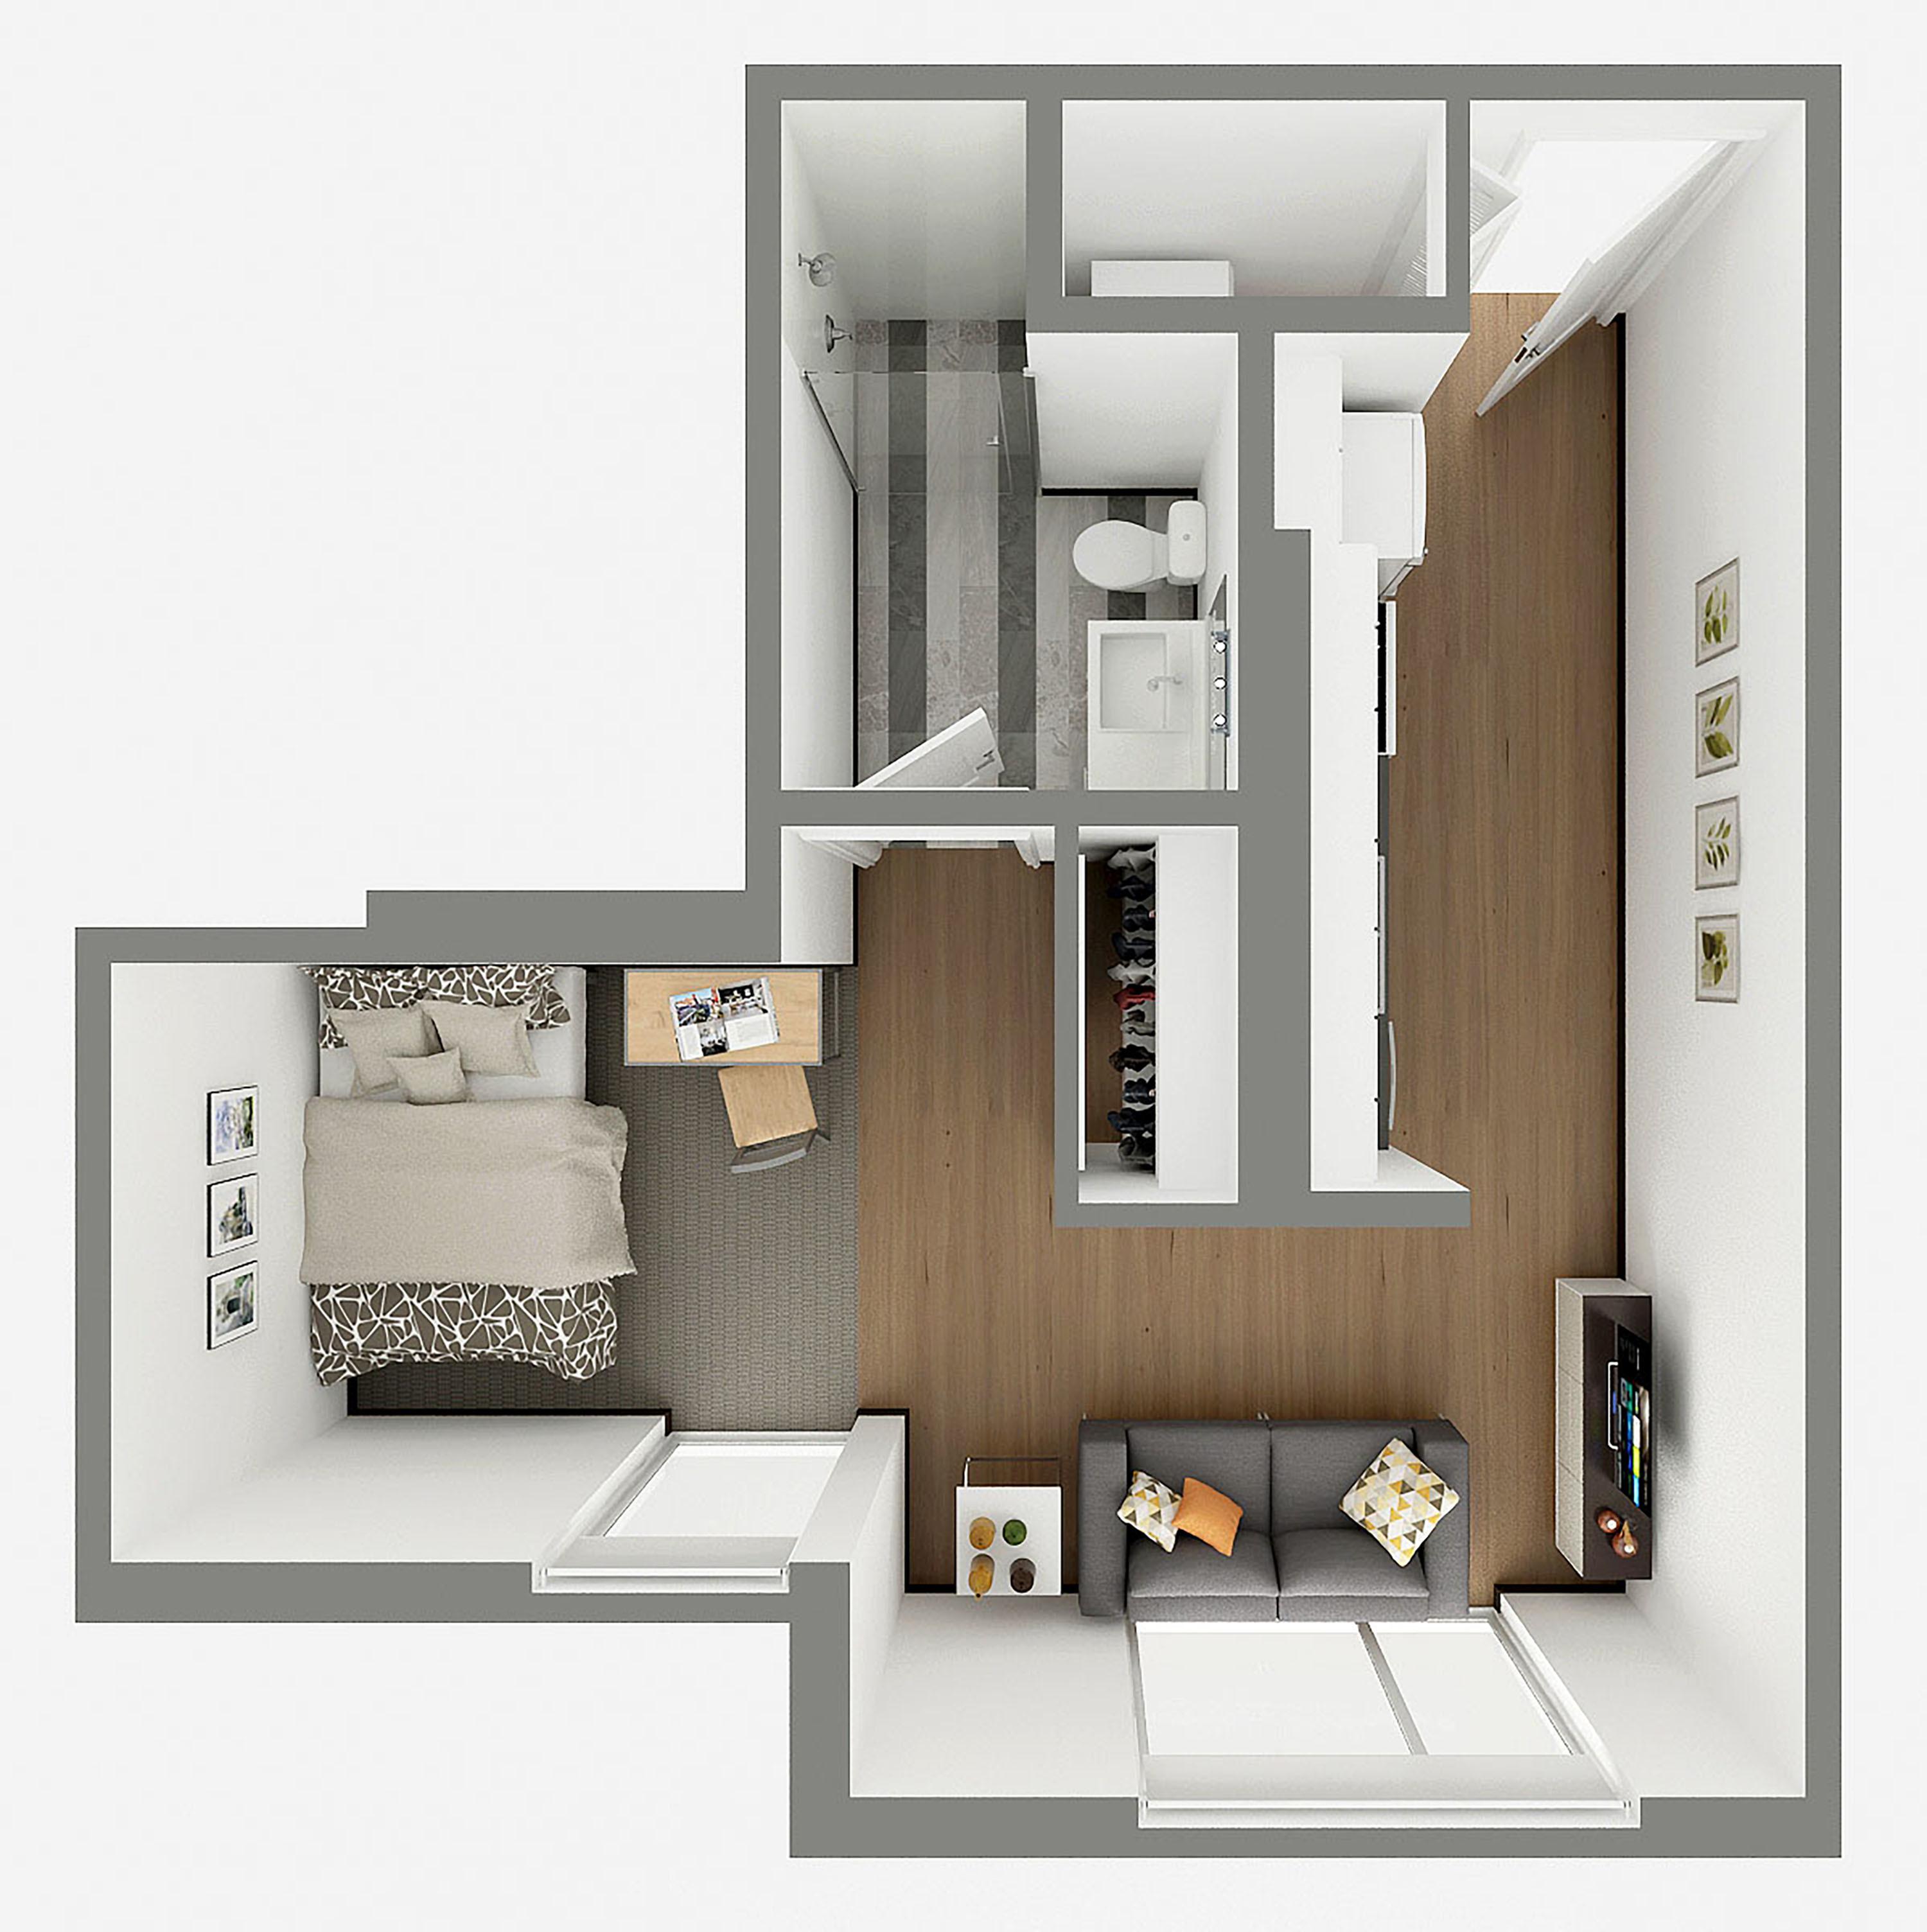 S1 Penthouse